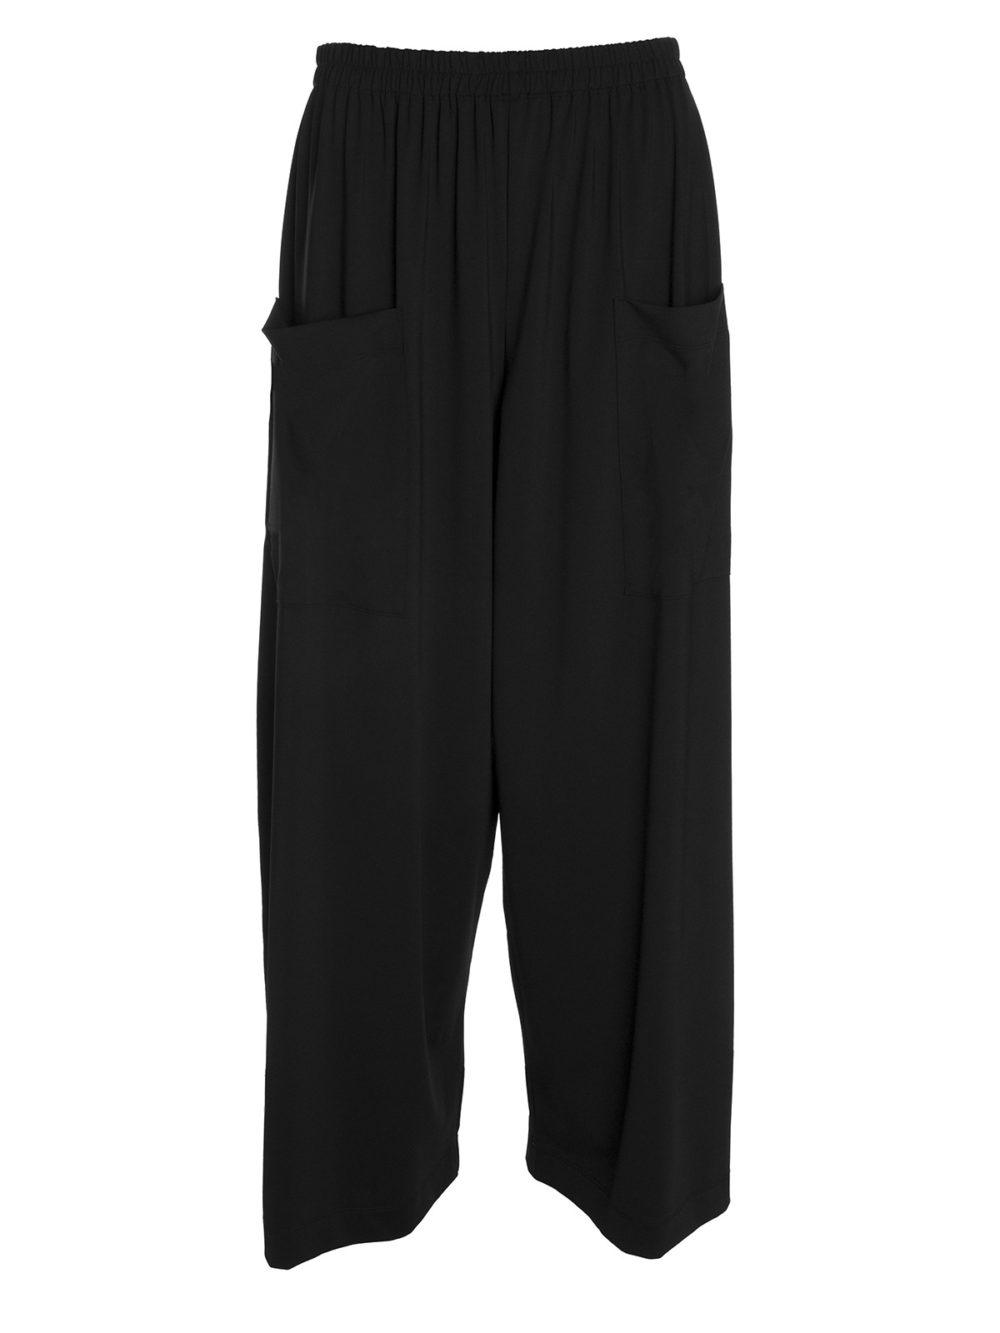 Mali Pants Elemente Clemente Katie Kerr Women's Clothing